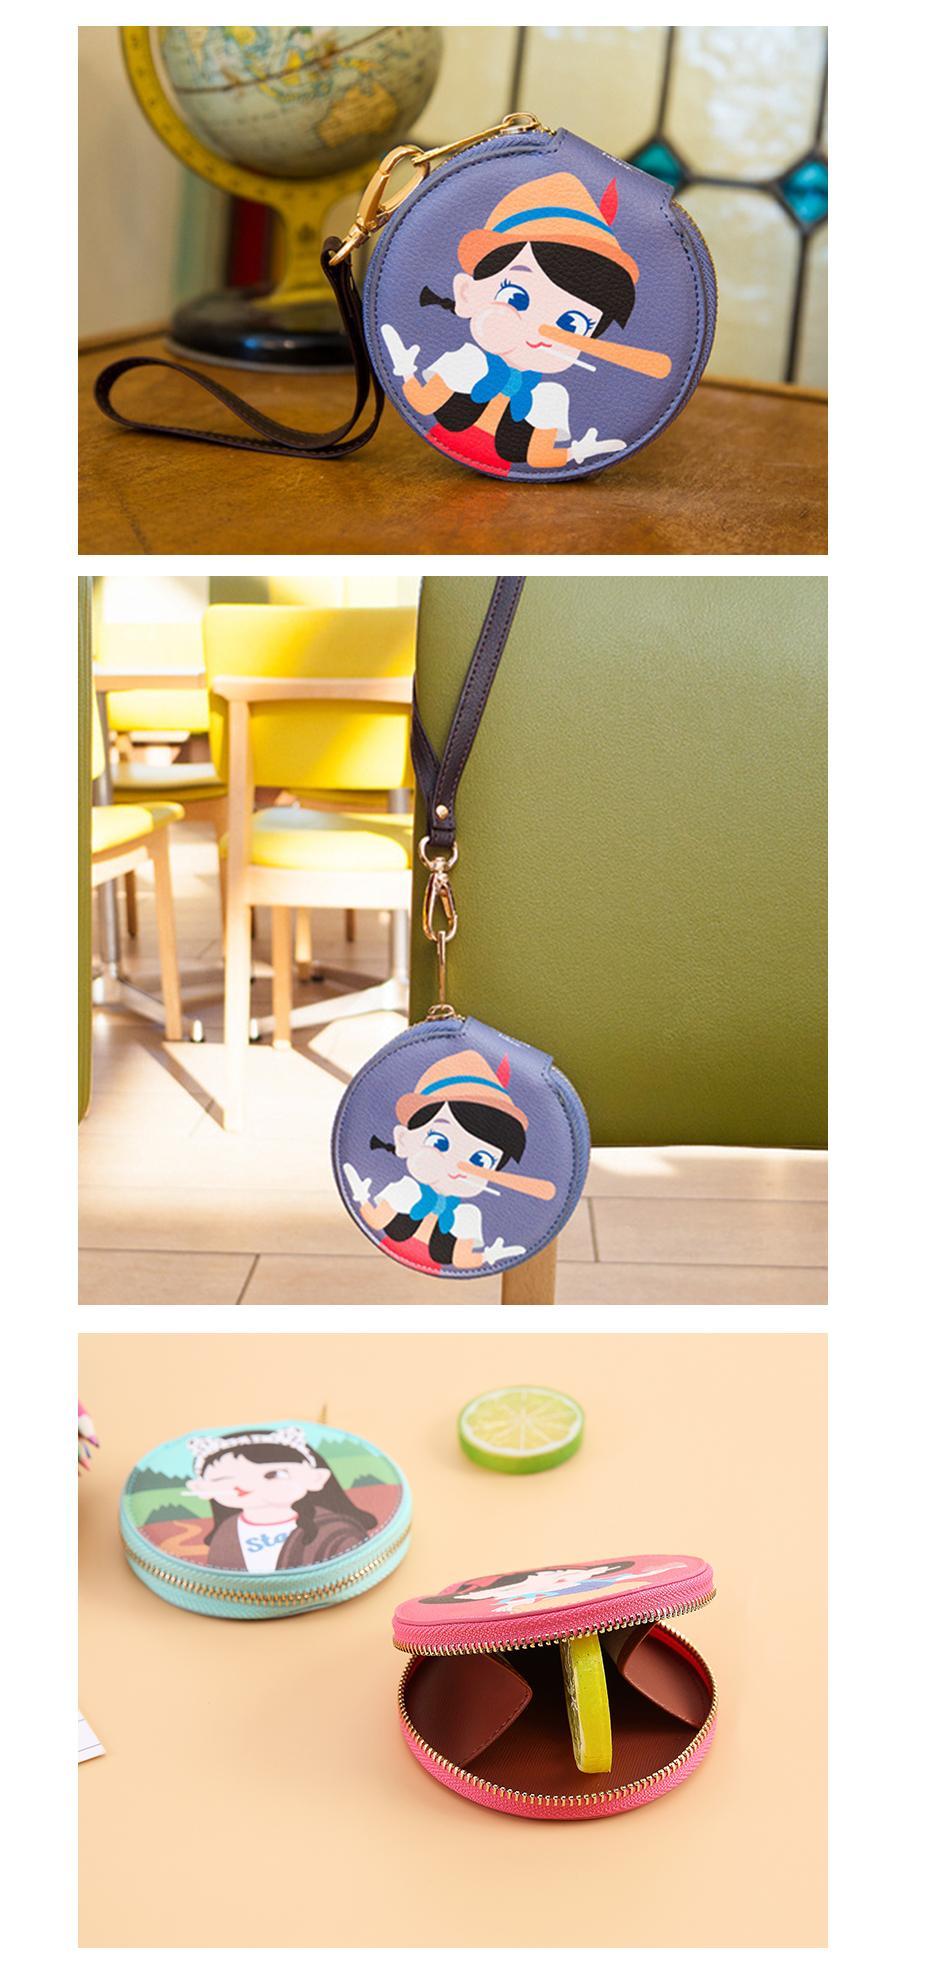 Bentoy moda dibujos animados pequeño monedero cartera mujer cremallera dinero bolsa llavero para bolso bolsa caja almacenamiento redonda para auriculares 3